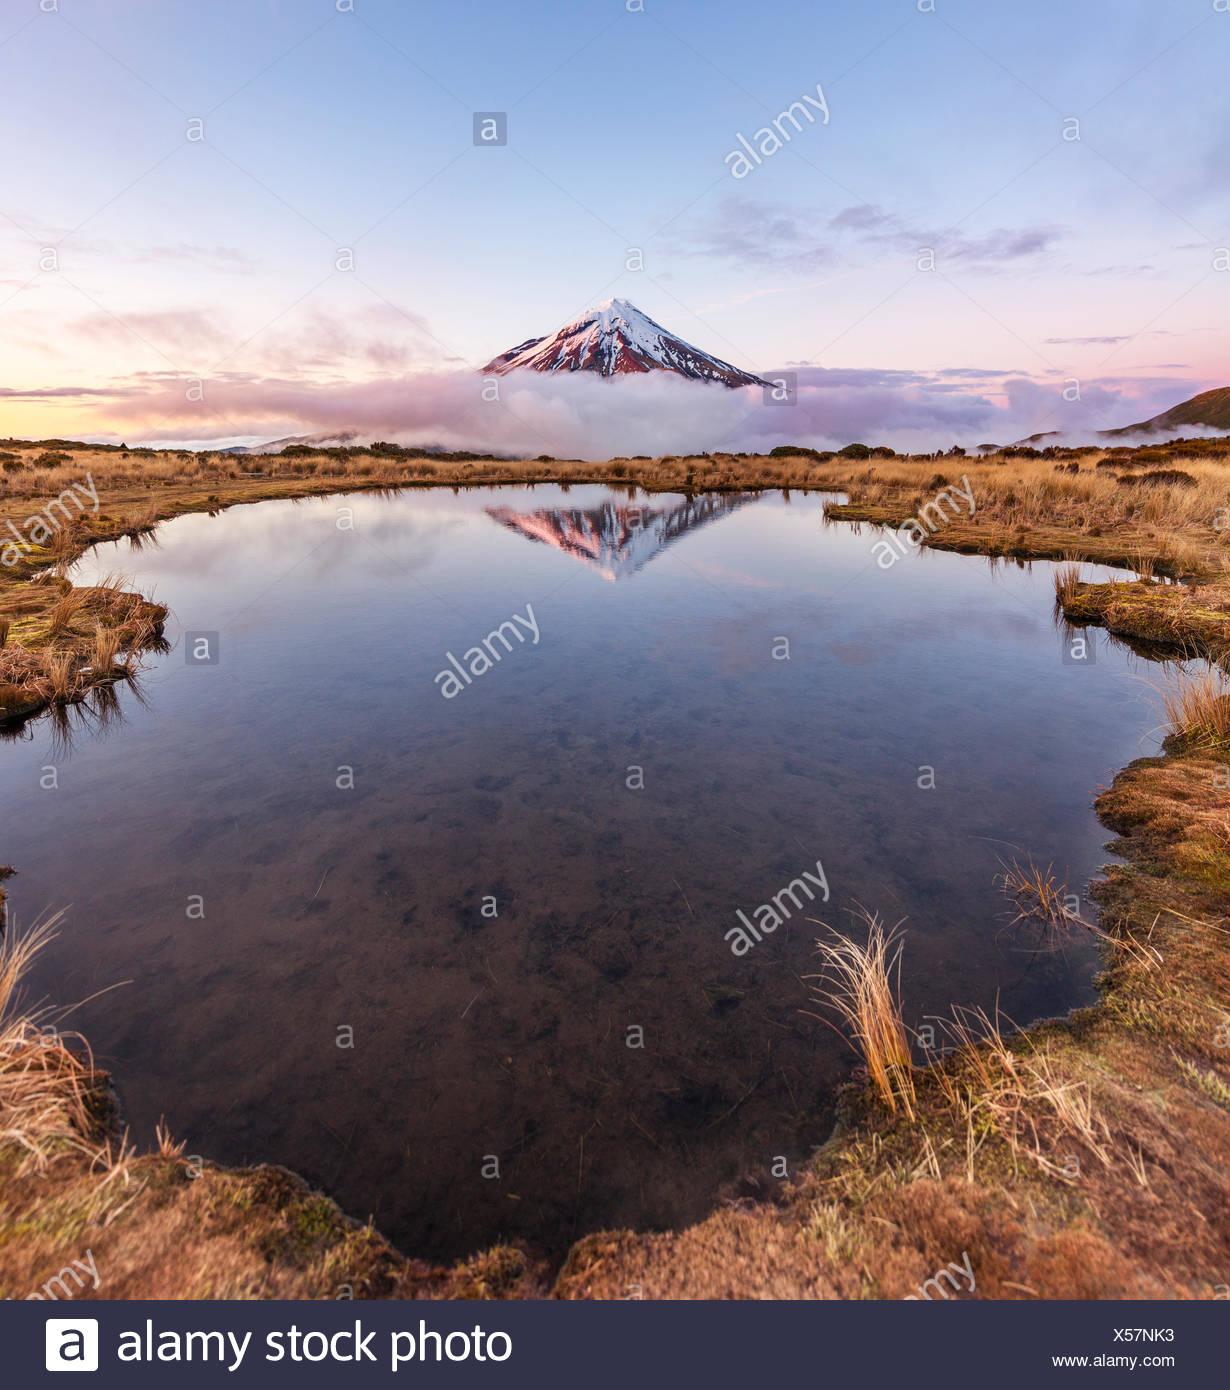 Reflection in Pouakai Tarn lake, pink clouds around stratovolcano Mount Taranaki or Mount Egmont at sunset, Egmont National Park - Stock Image